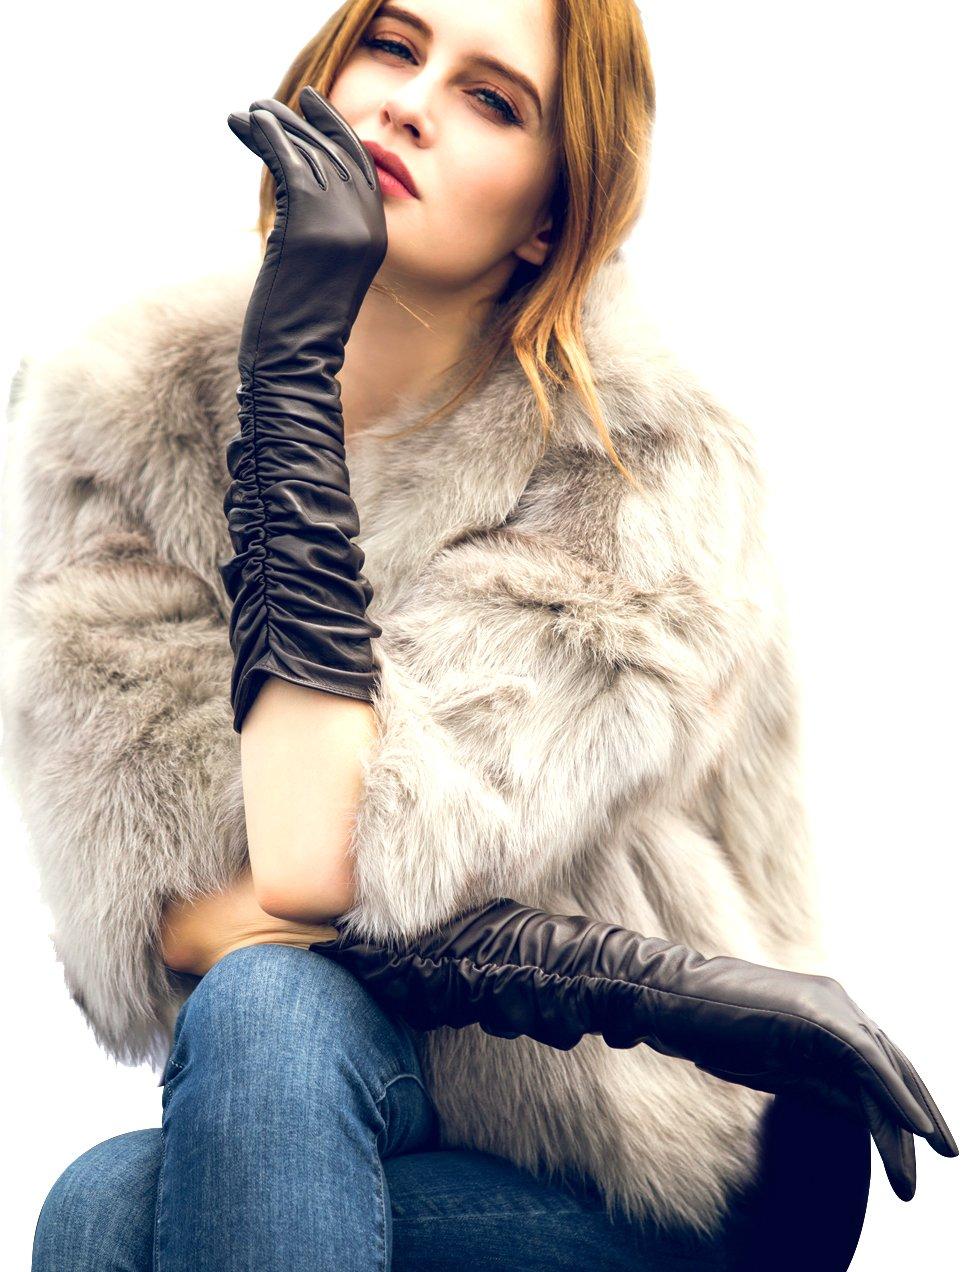 Women's Winter Touchscreen Warm Lined Long Evening Gloves, Italian Sheep Nappa 6.5''/S